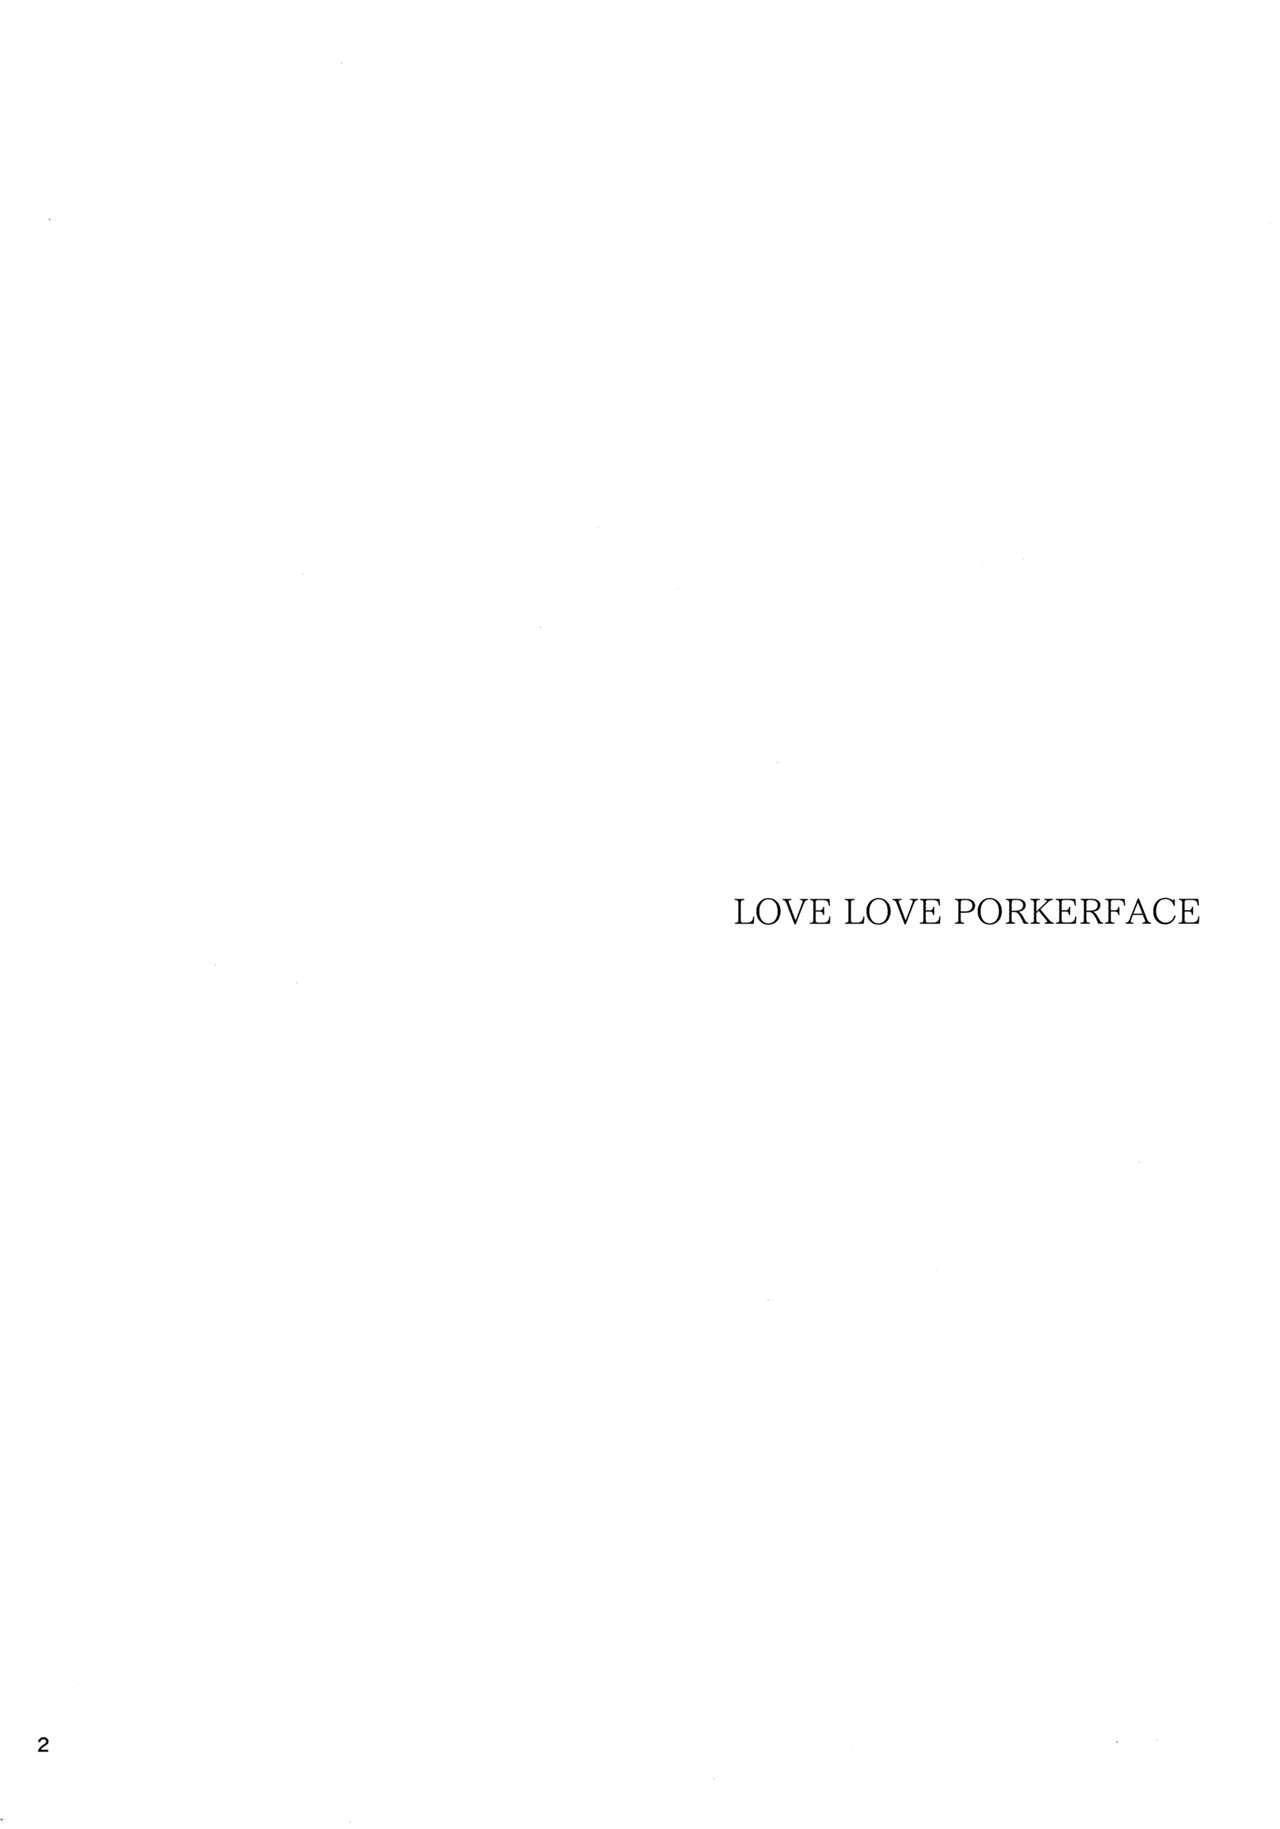 LOVE LOVE PORKERFACE 3